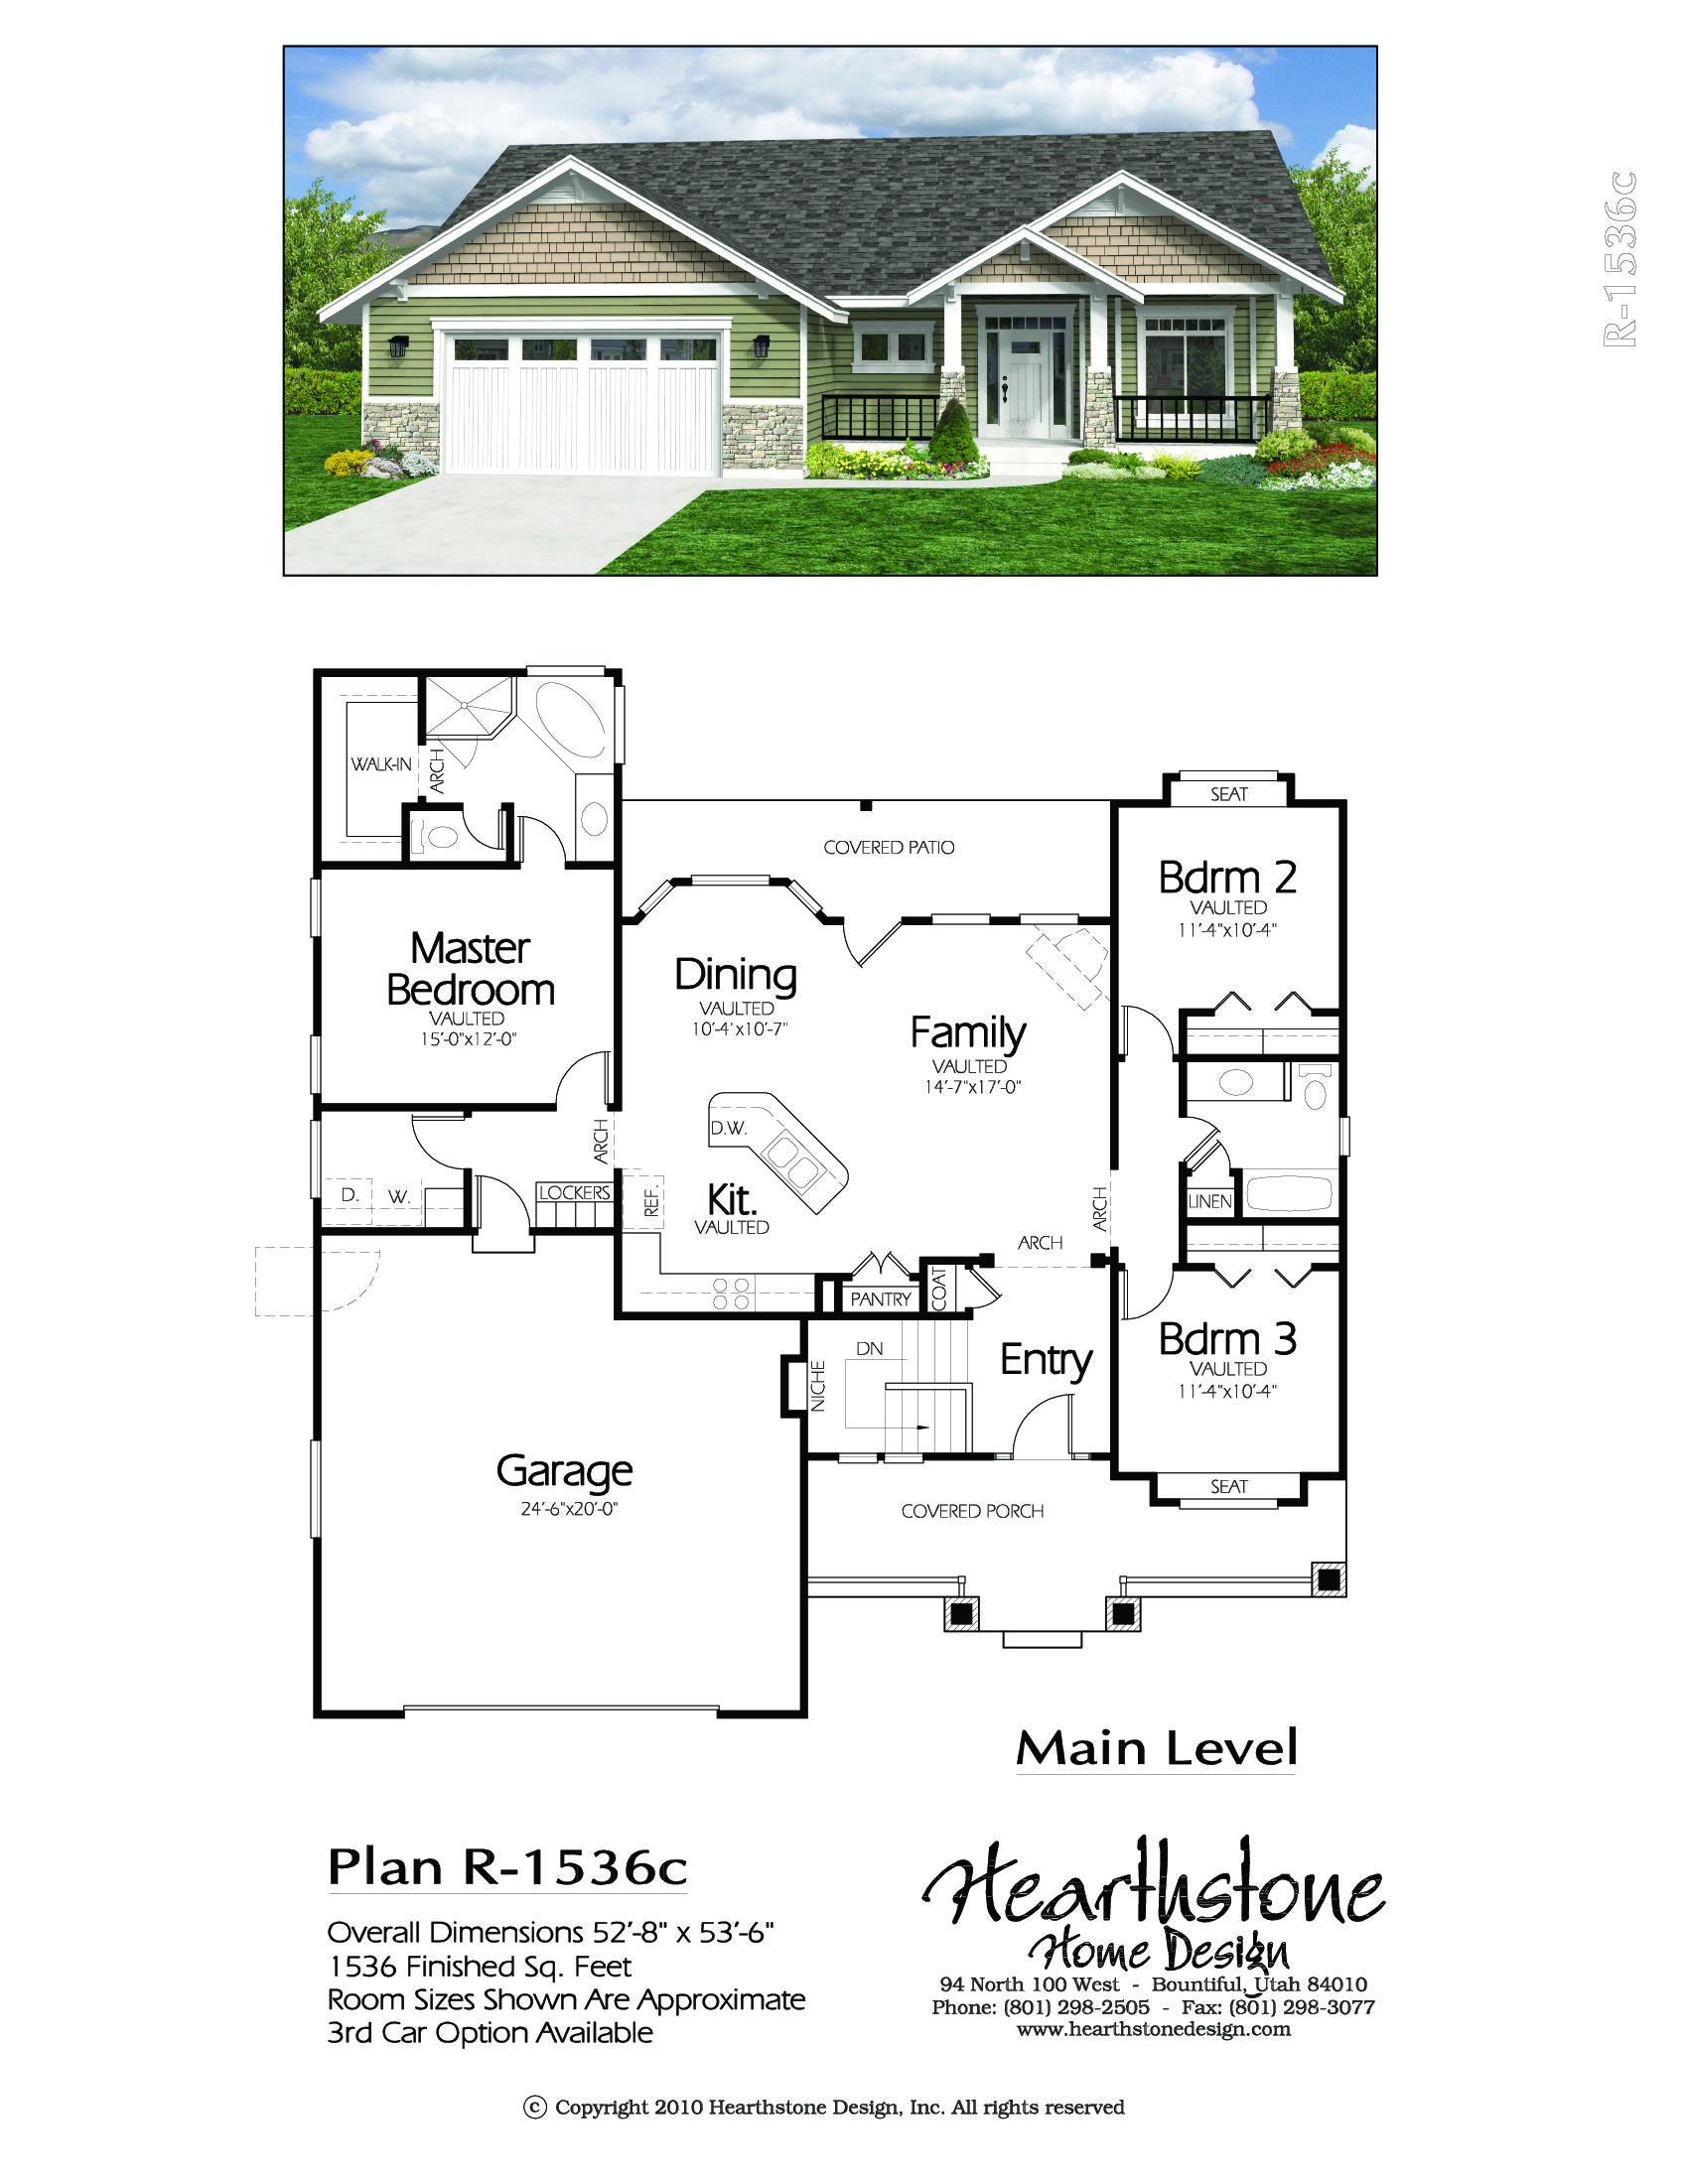 R 1536c Hearthstone Home Design Sims House Plans Ranch Style House Plans Building Plans House